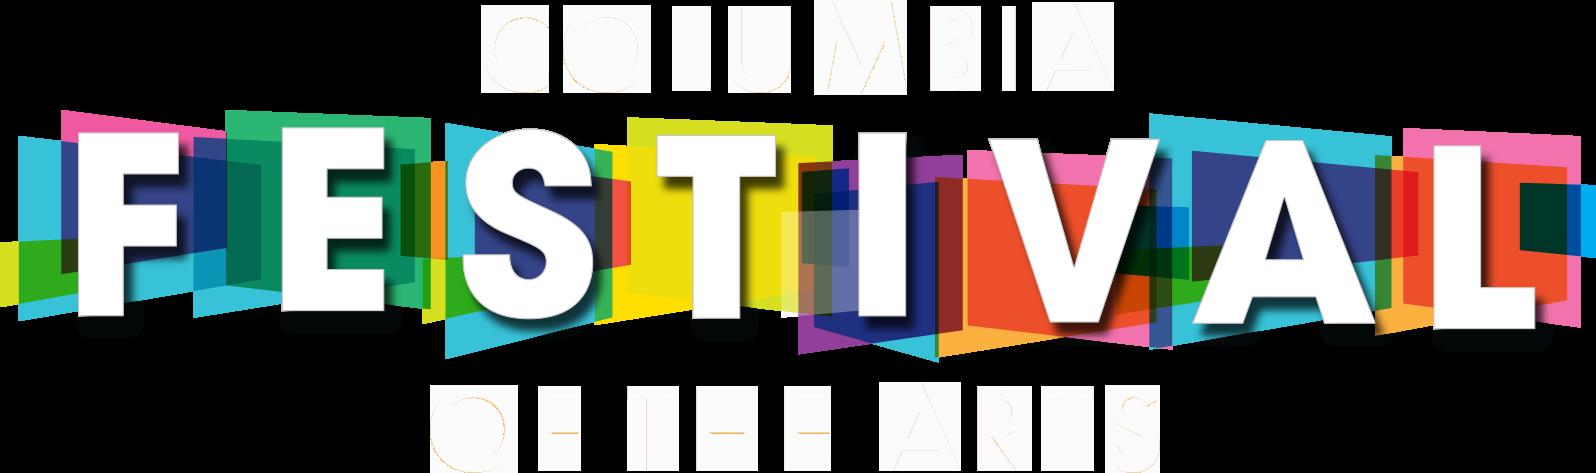 Columbia Arts Channel